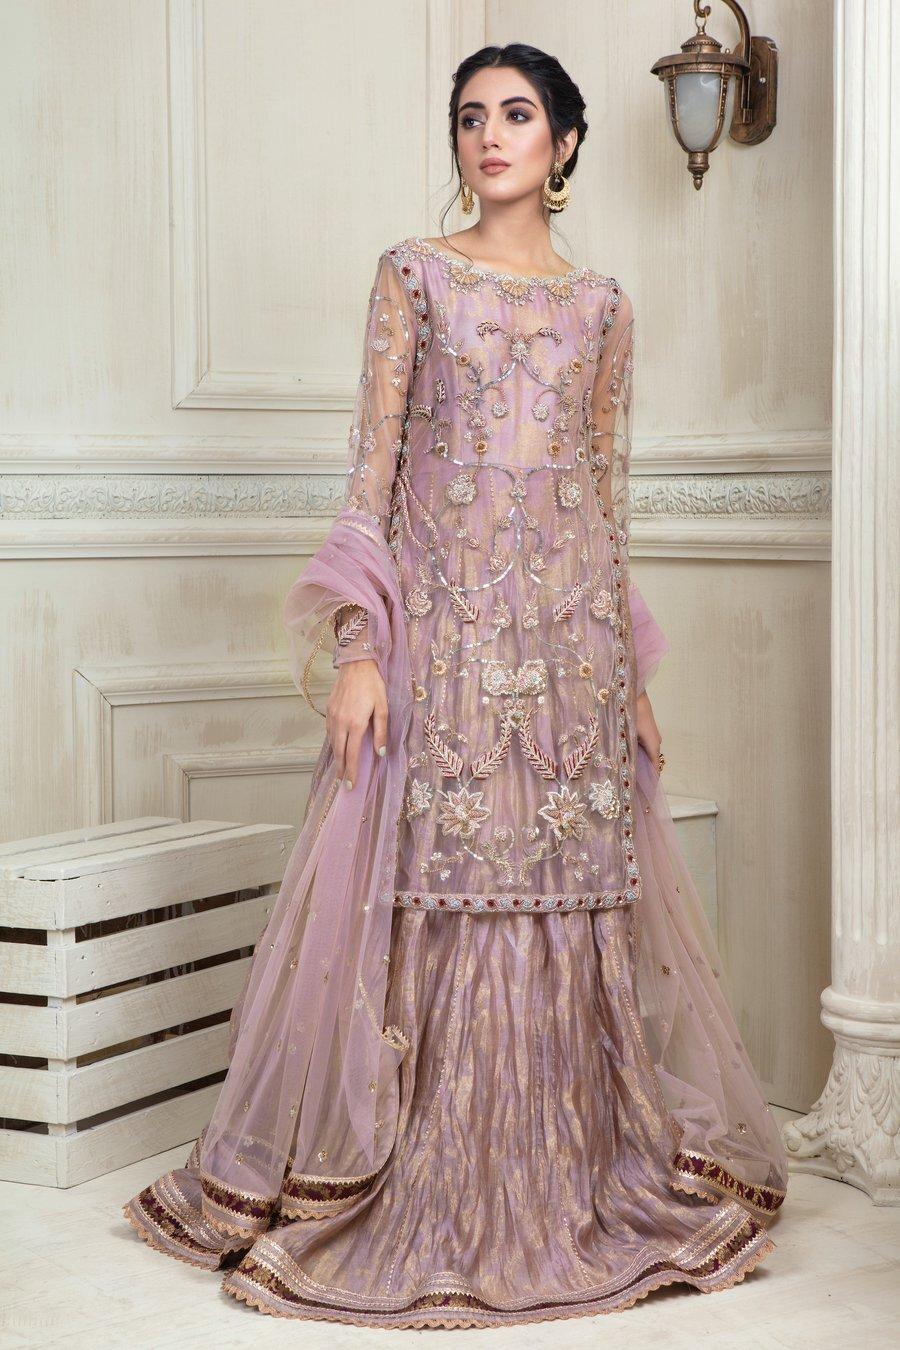 Mehndi design dress